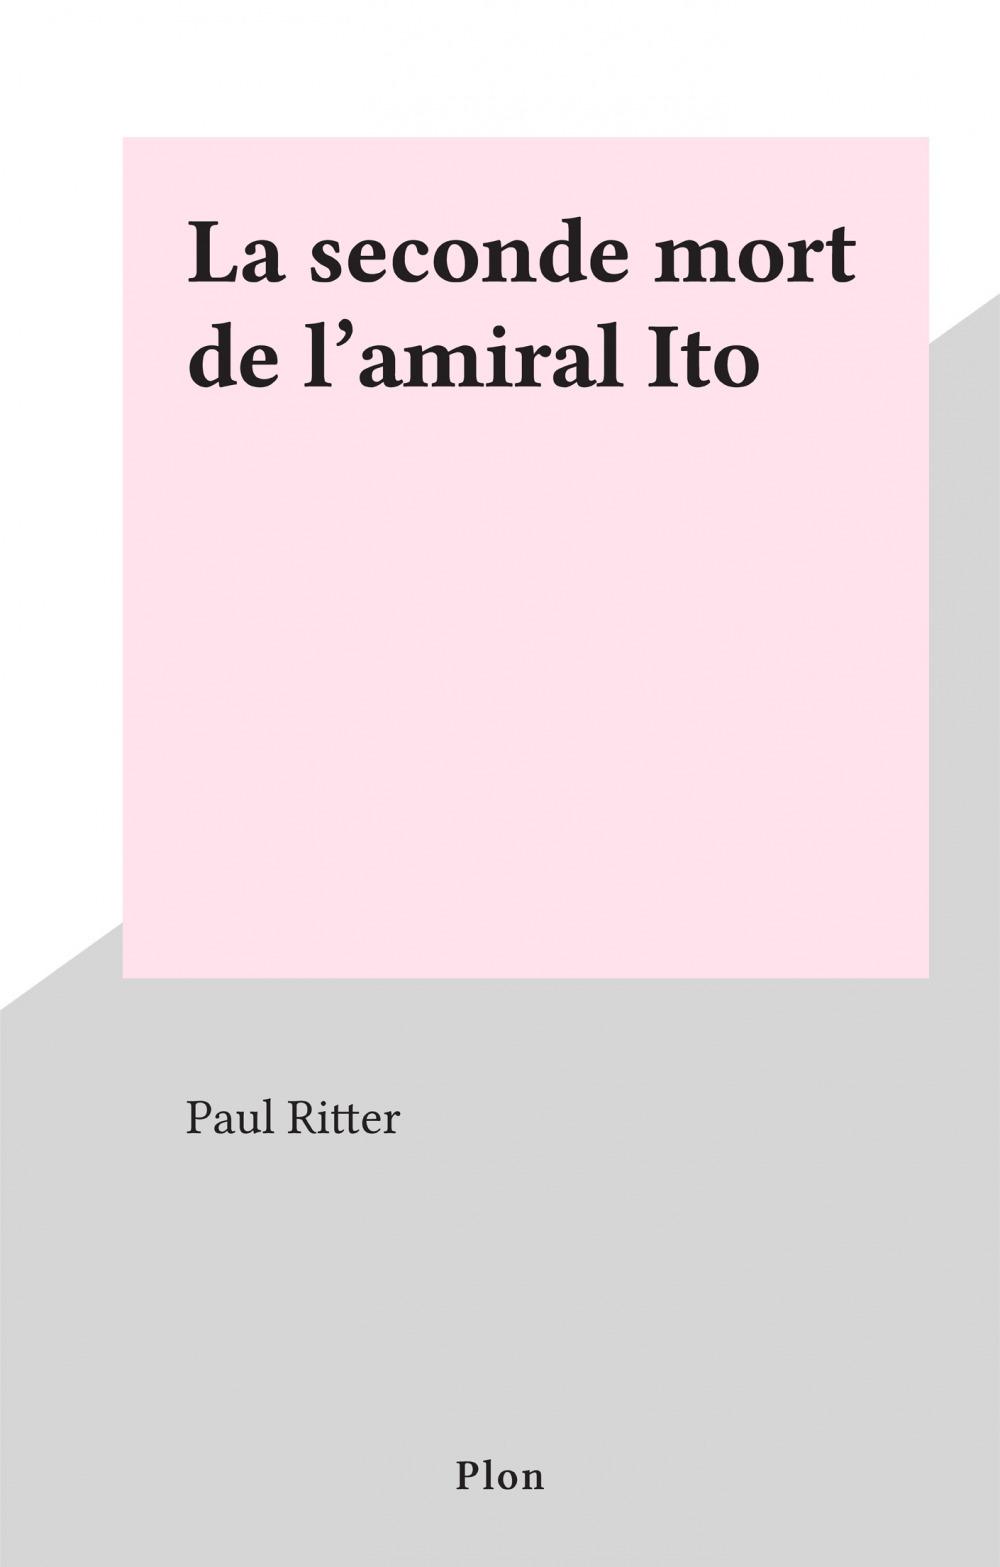 La seconde mort de l'amiral Ito  - Paul Ritter